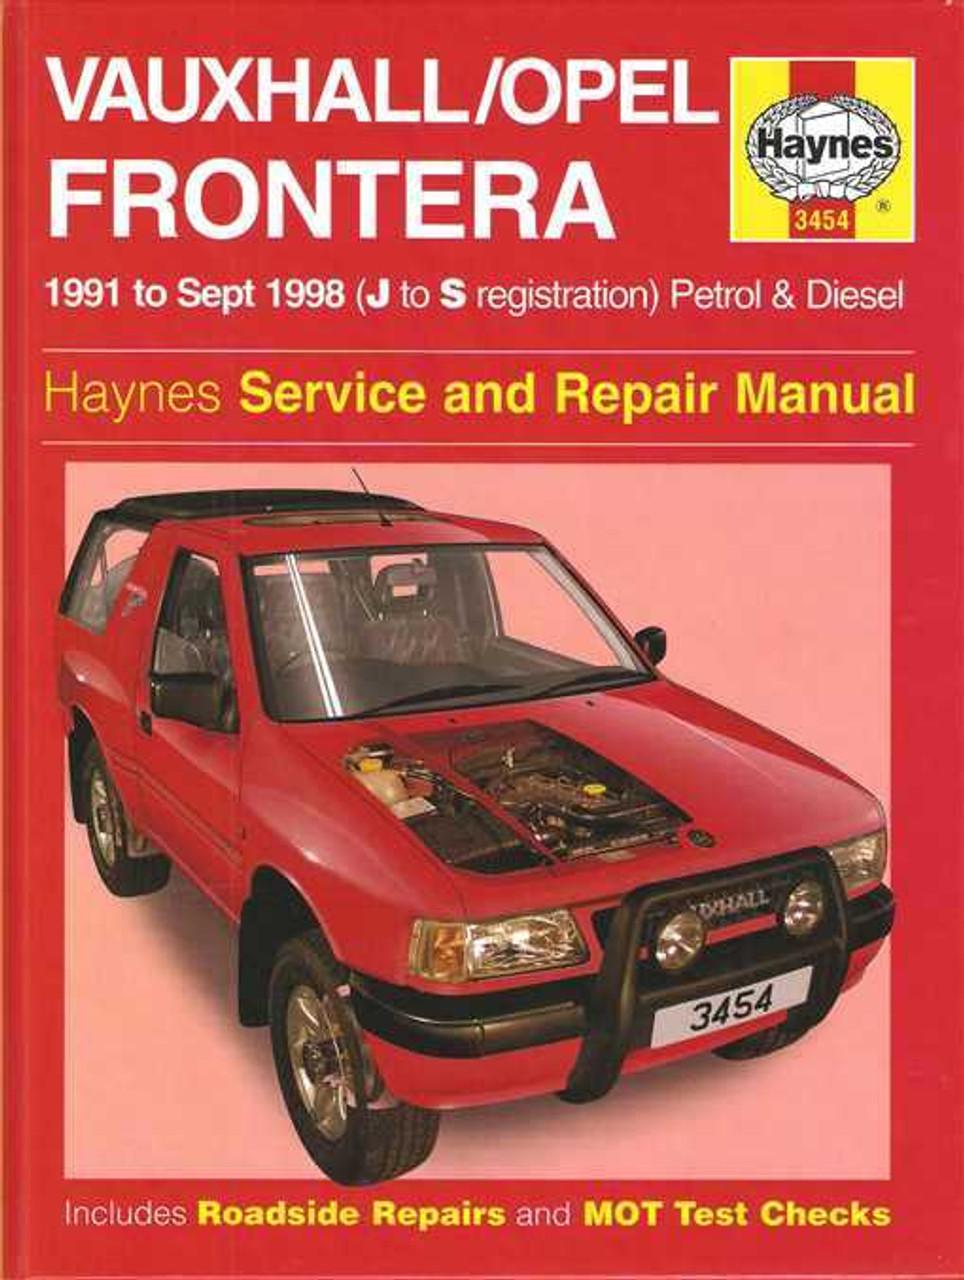 holden frontera petrol and diesel 1991 1998 workshop manual rh automotobookshop com au Polaris ATV Owners Manual Haynes Repair Manuals